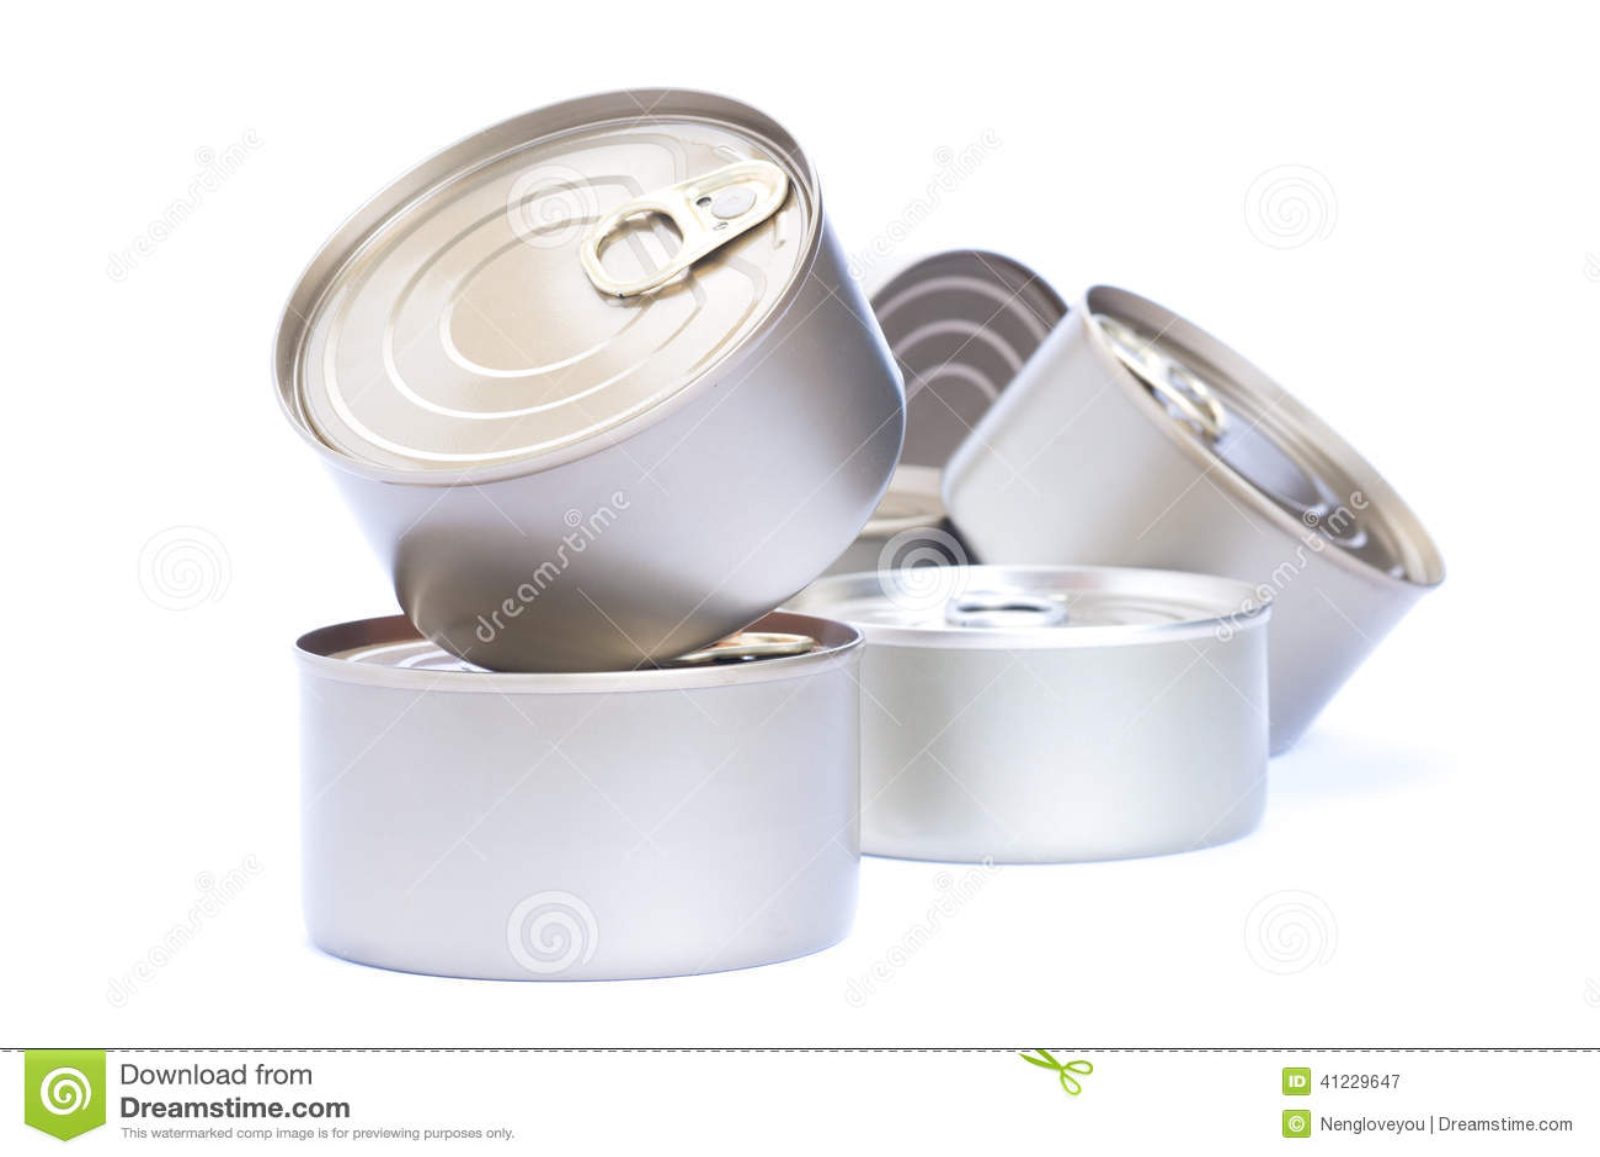 Aluminum cans aluminum cans food for Aluminum cuisine